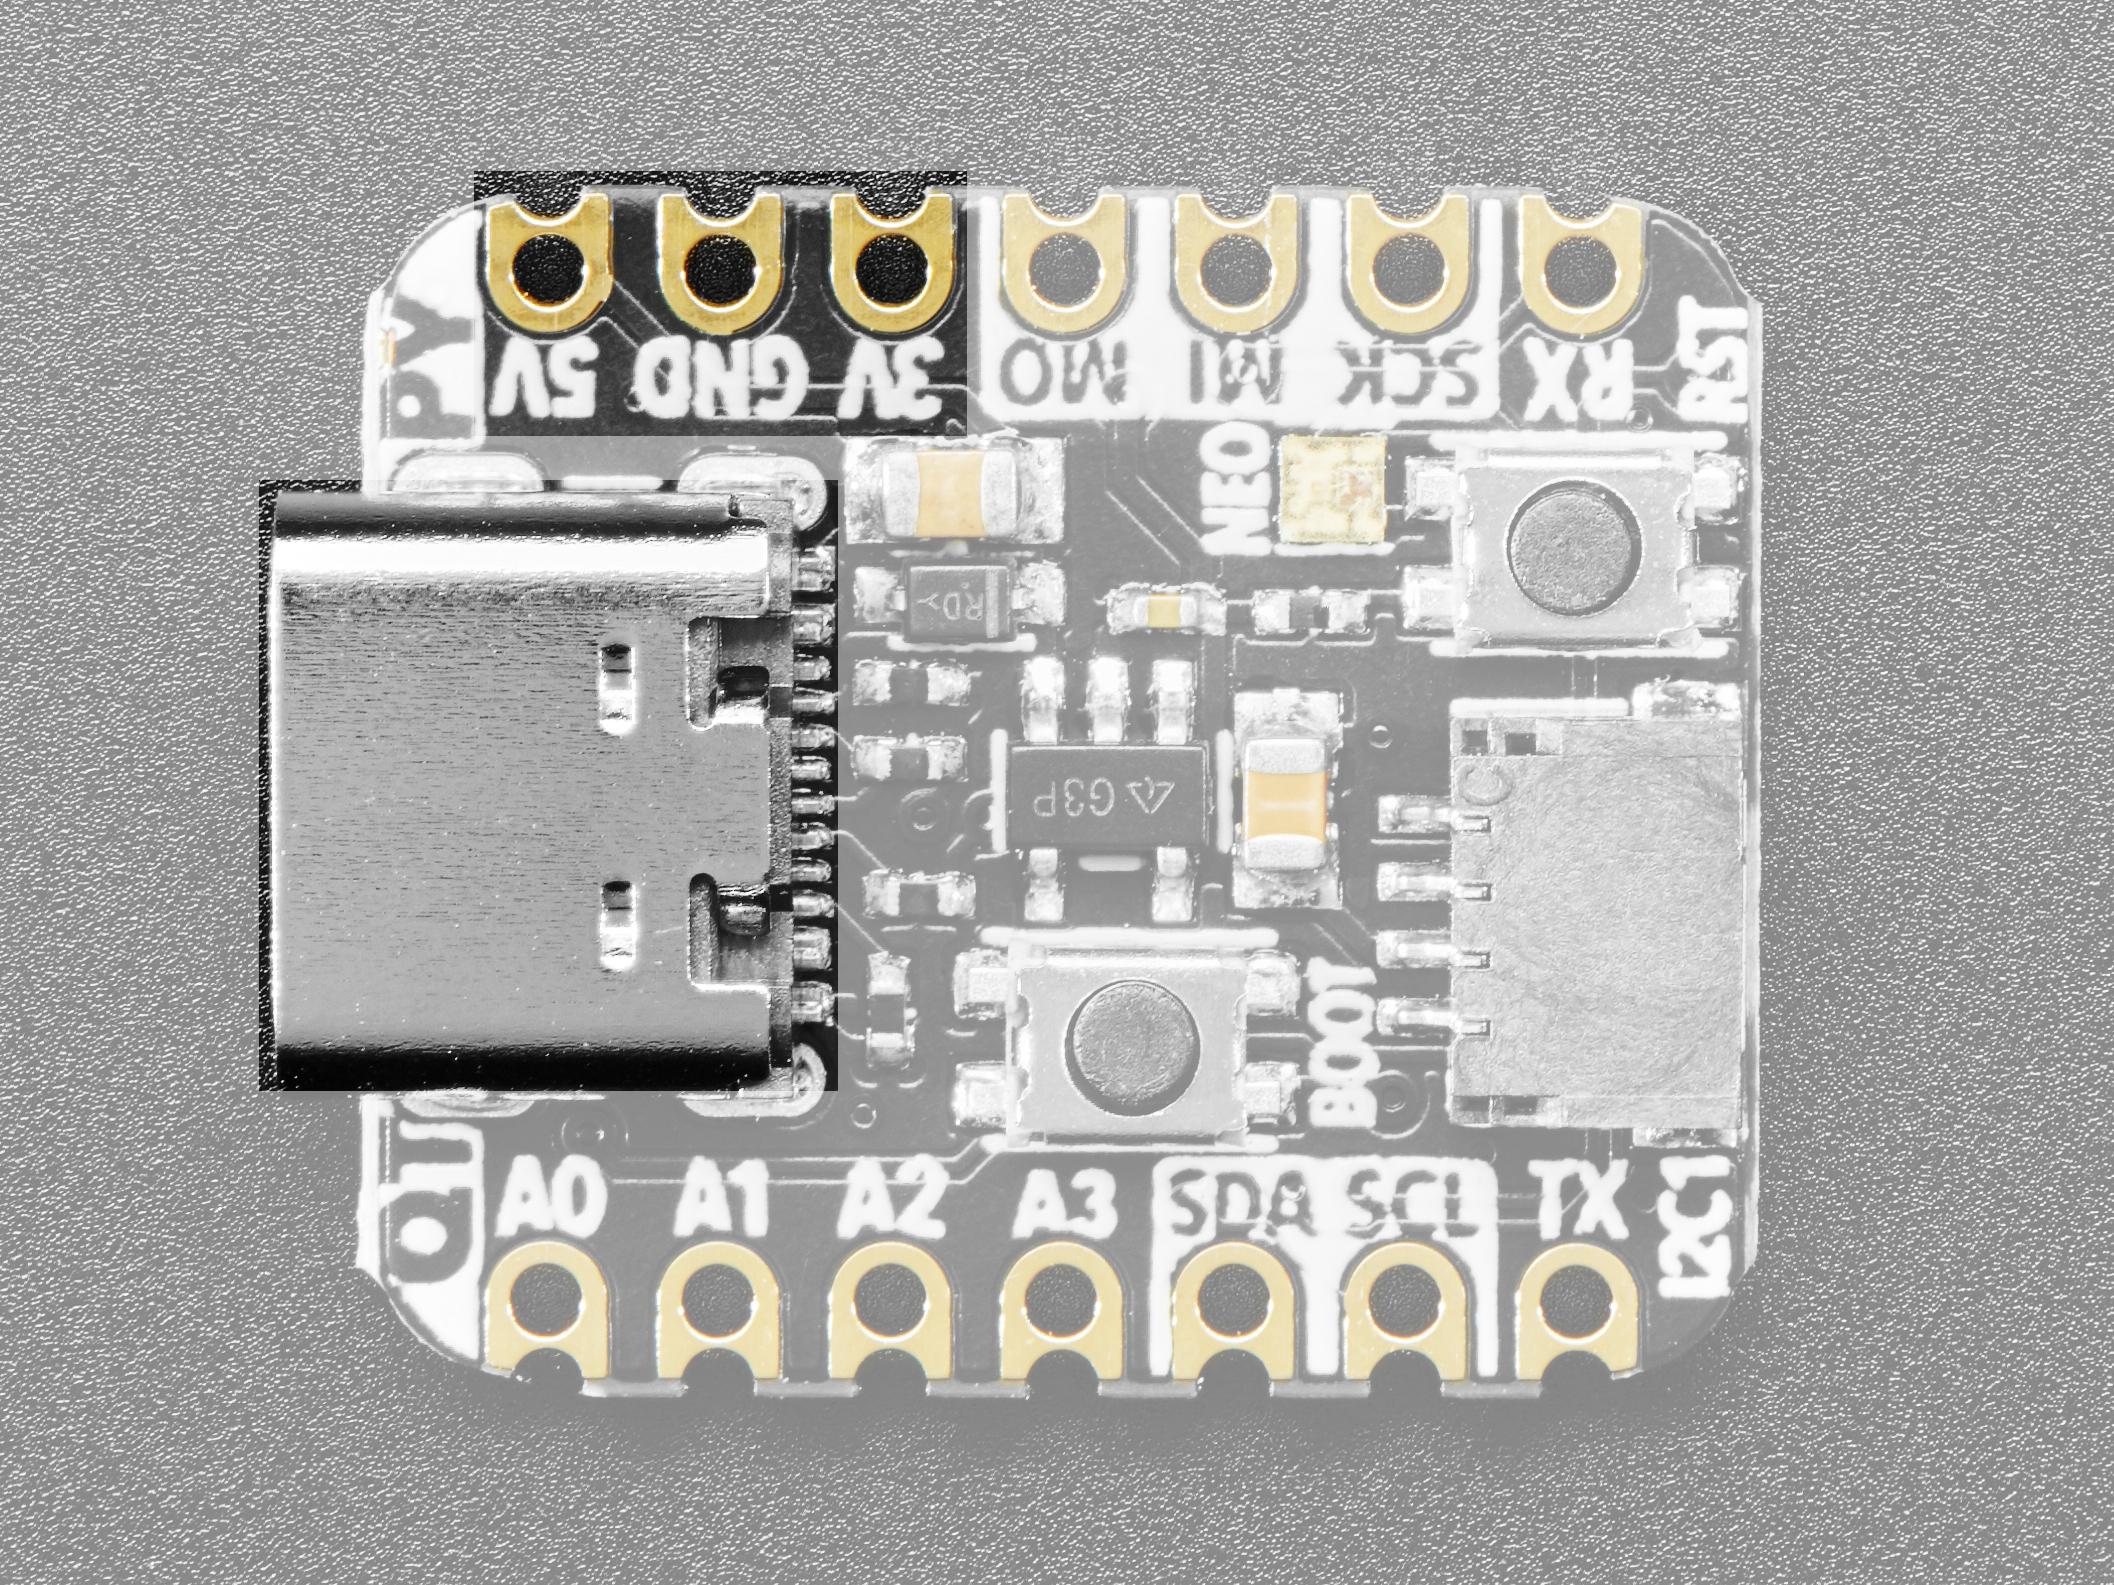 adafruit_products_QTRP_pinouts_USB_power.jpg